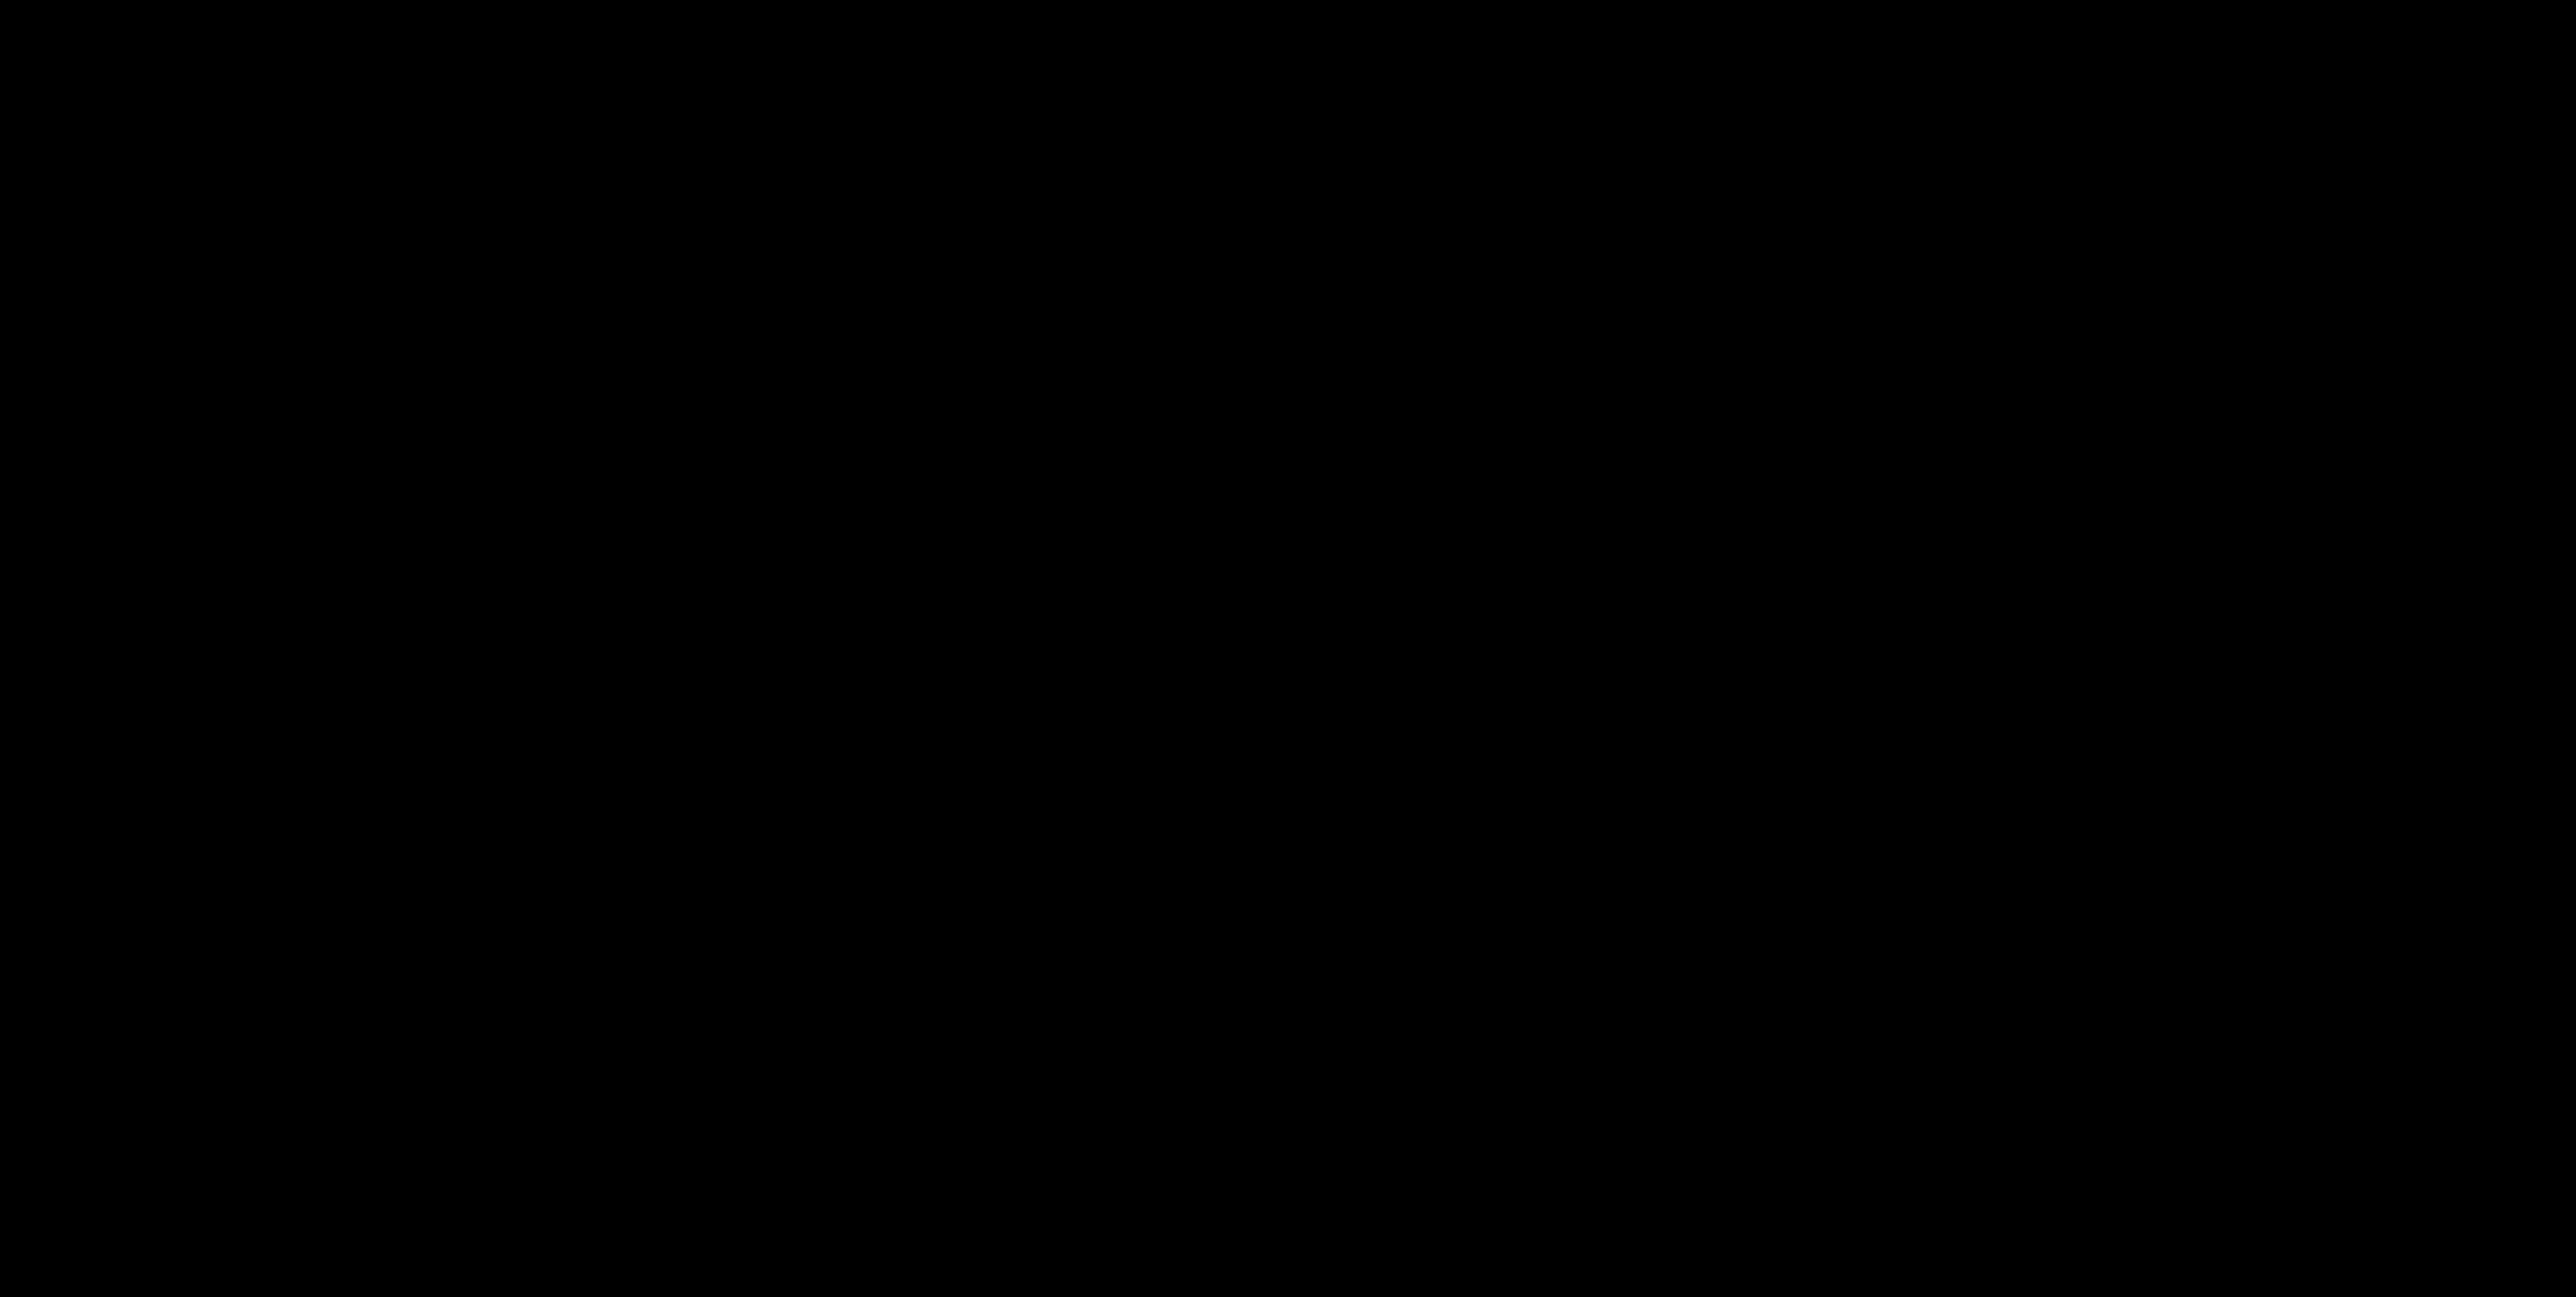 reebok logo 5 - Reebok Logo